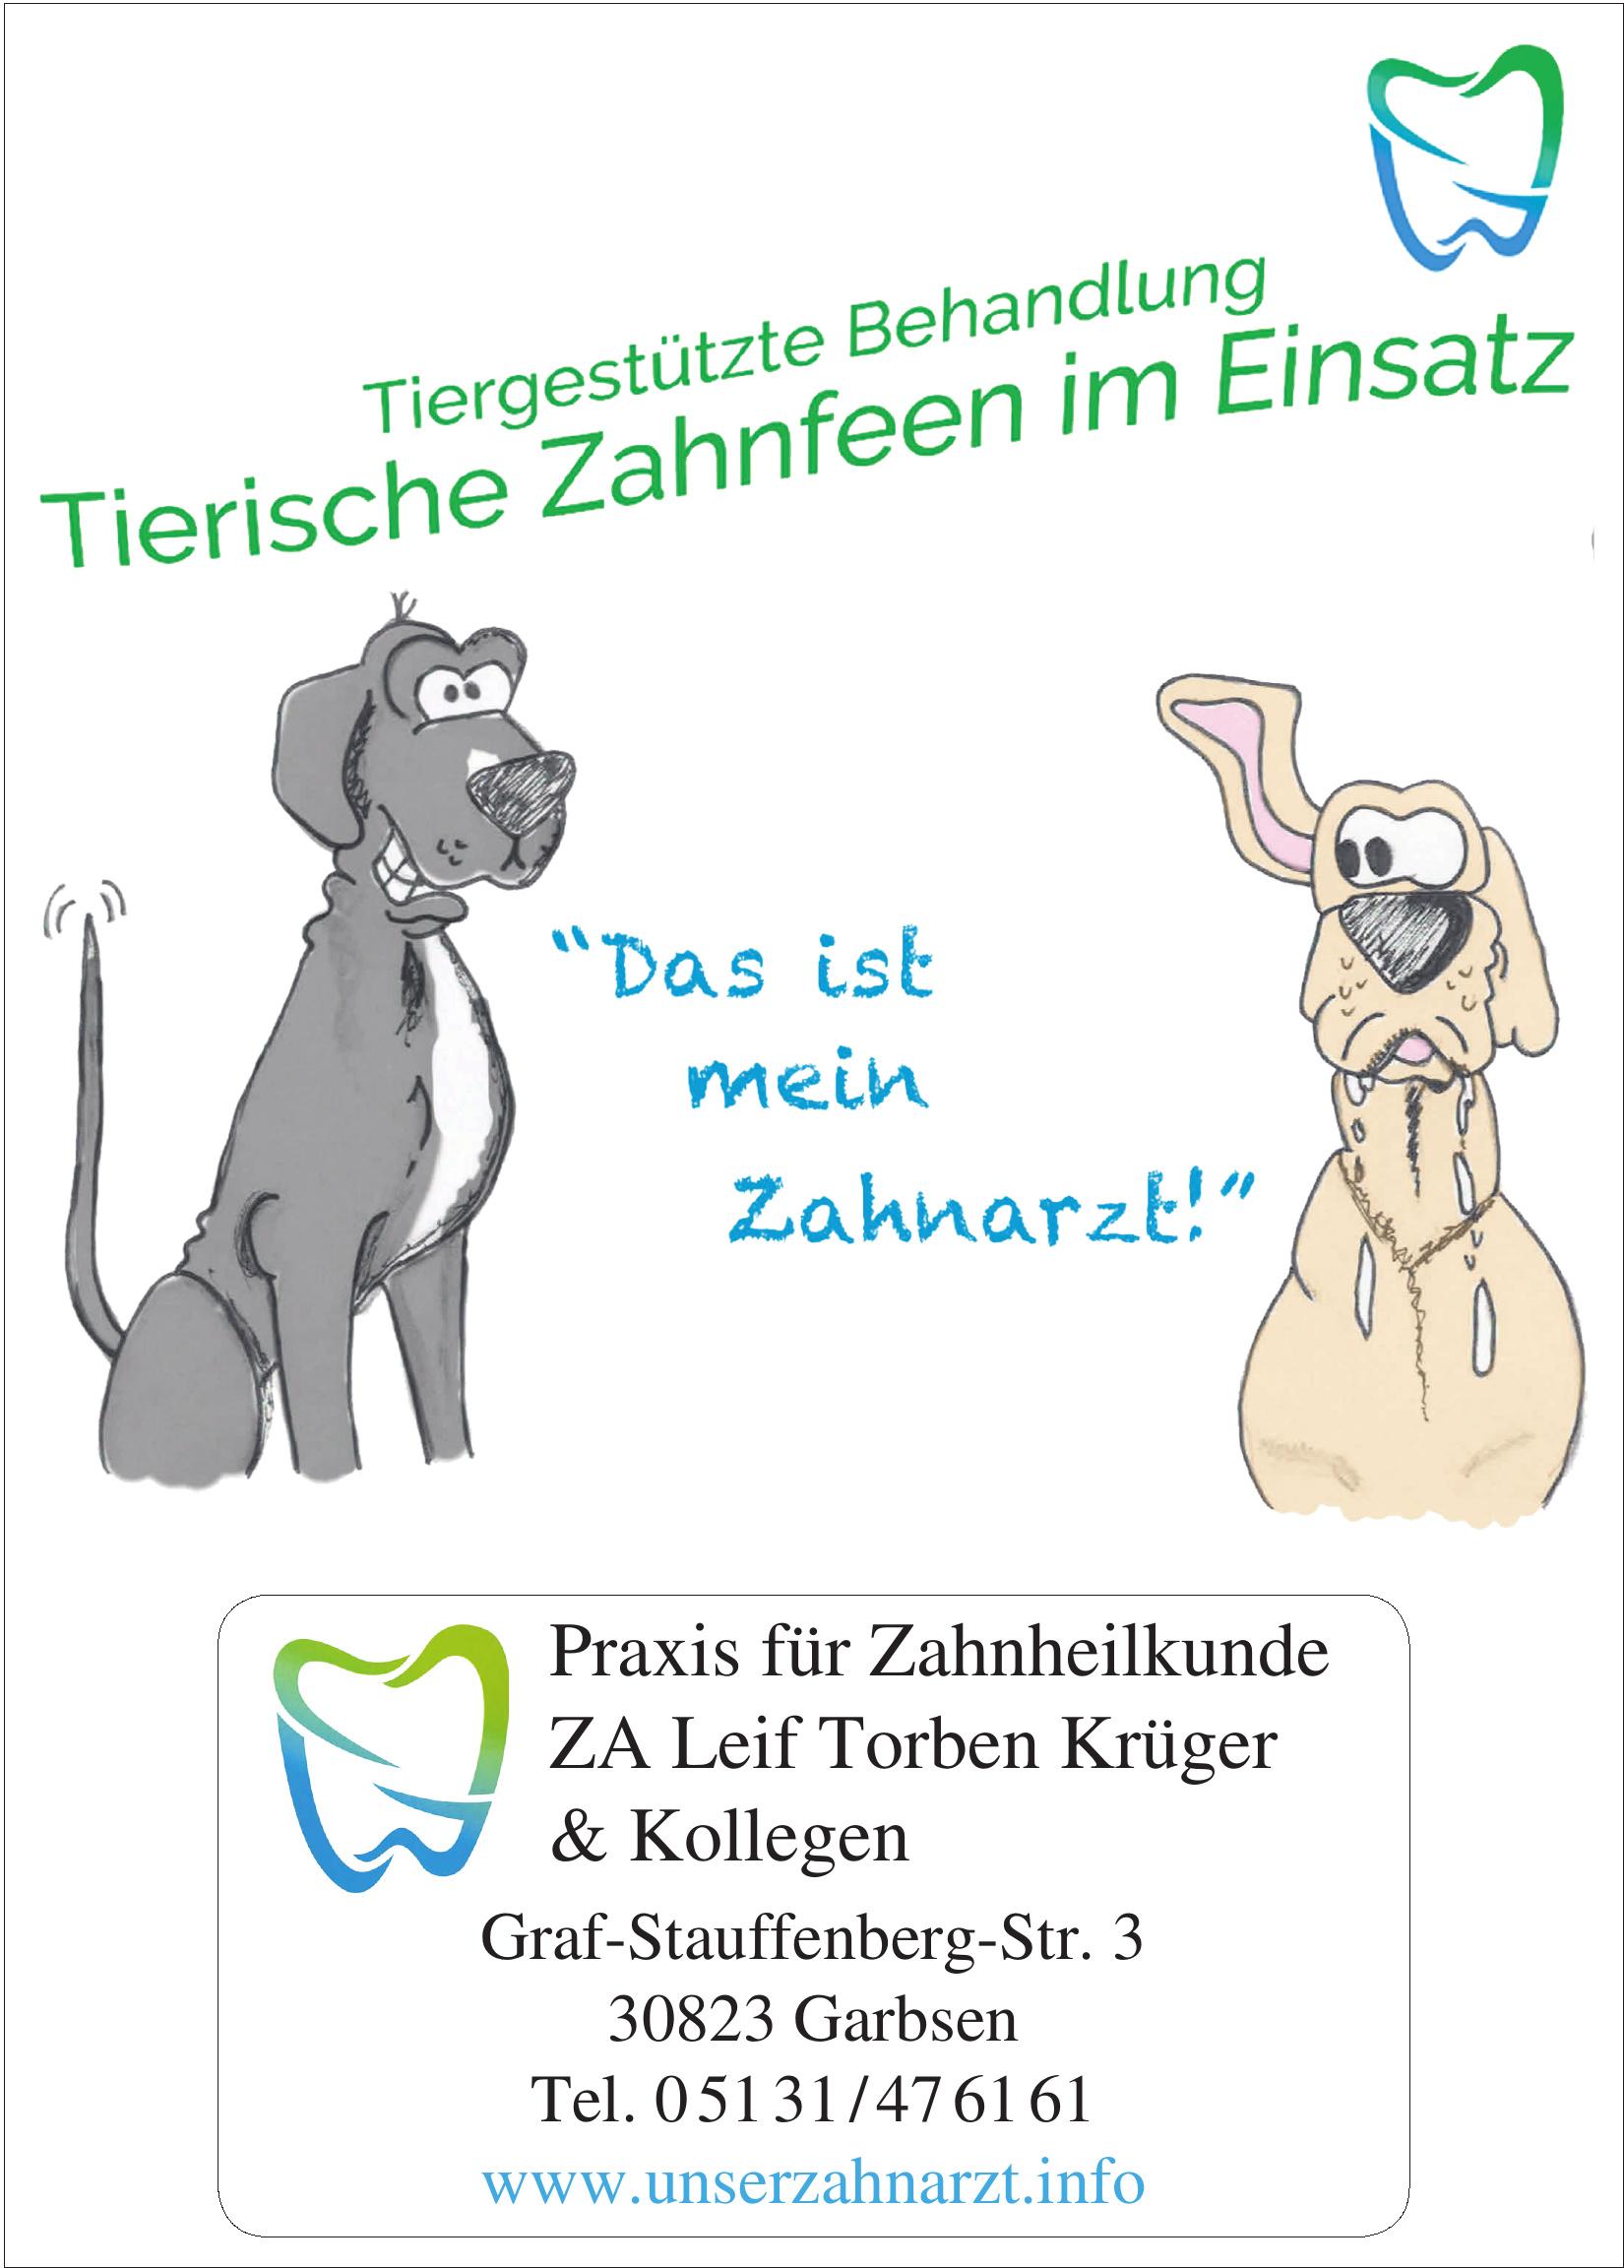 ZA Leif Torben Krüger & Kollegen